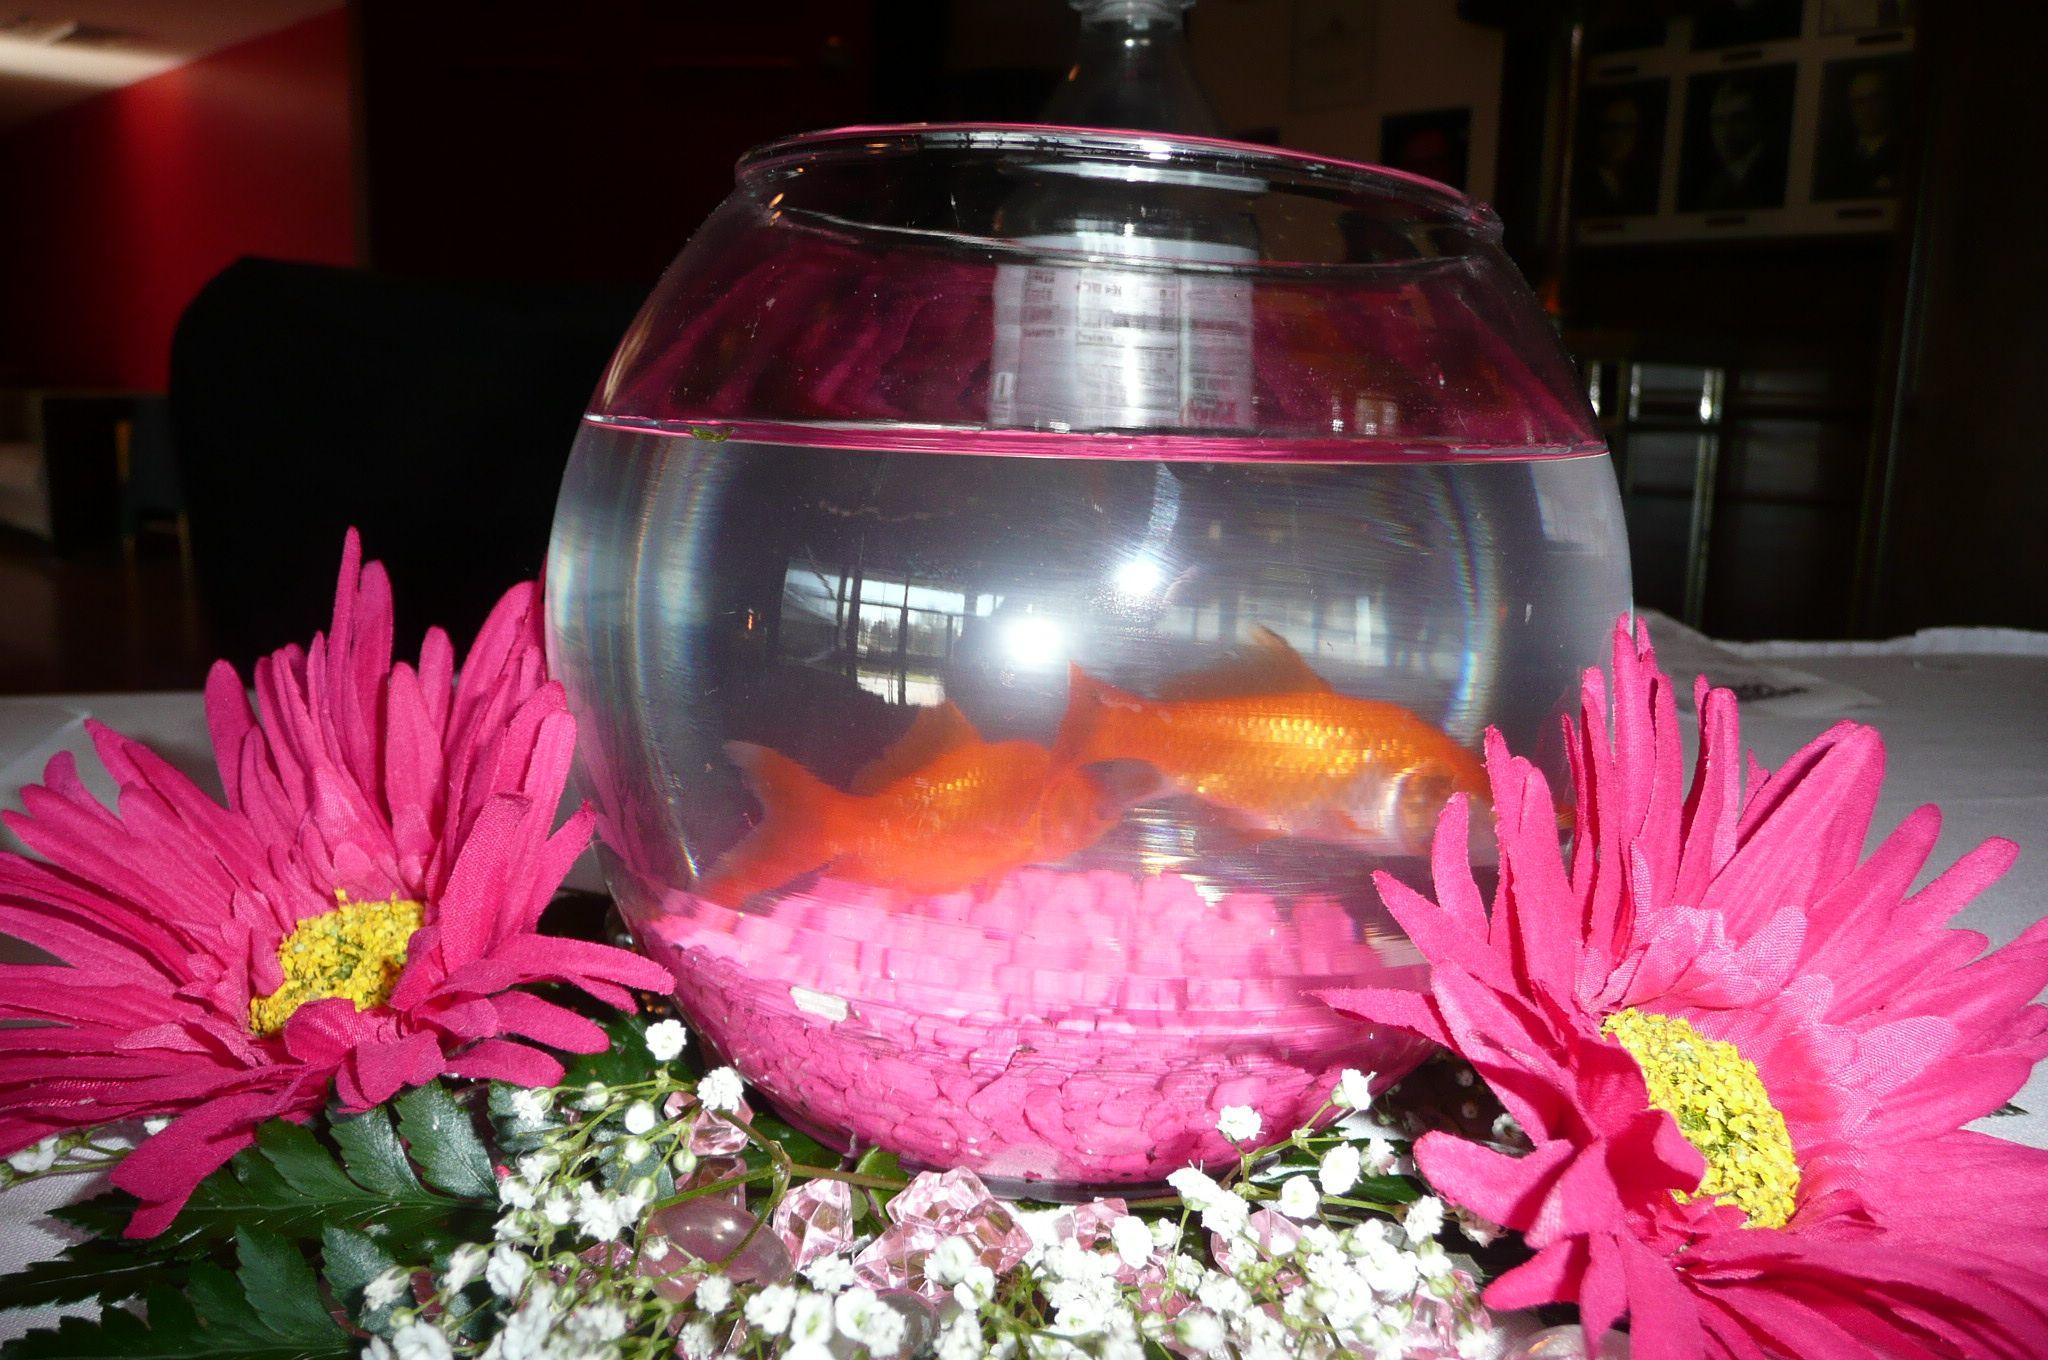 fishbowl centerpiece | Courtney | Pinterest | Fishbowl centerpiece ...